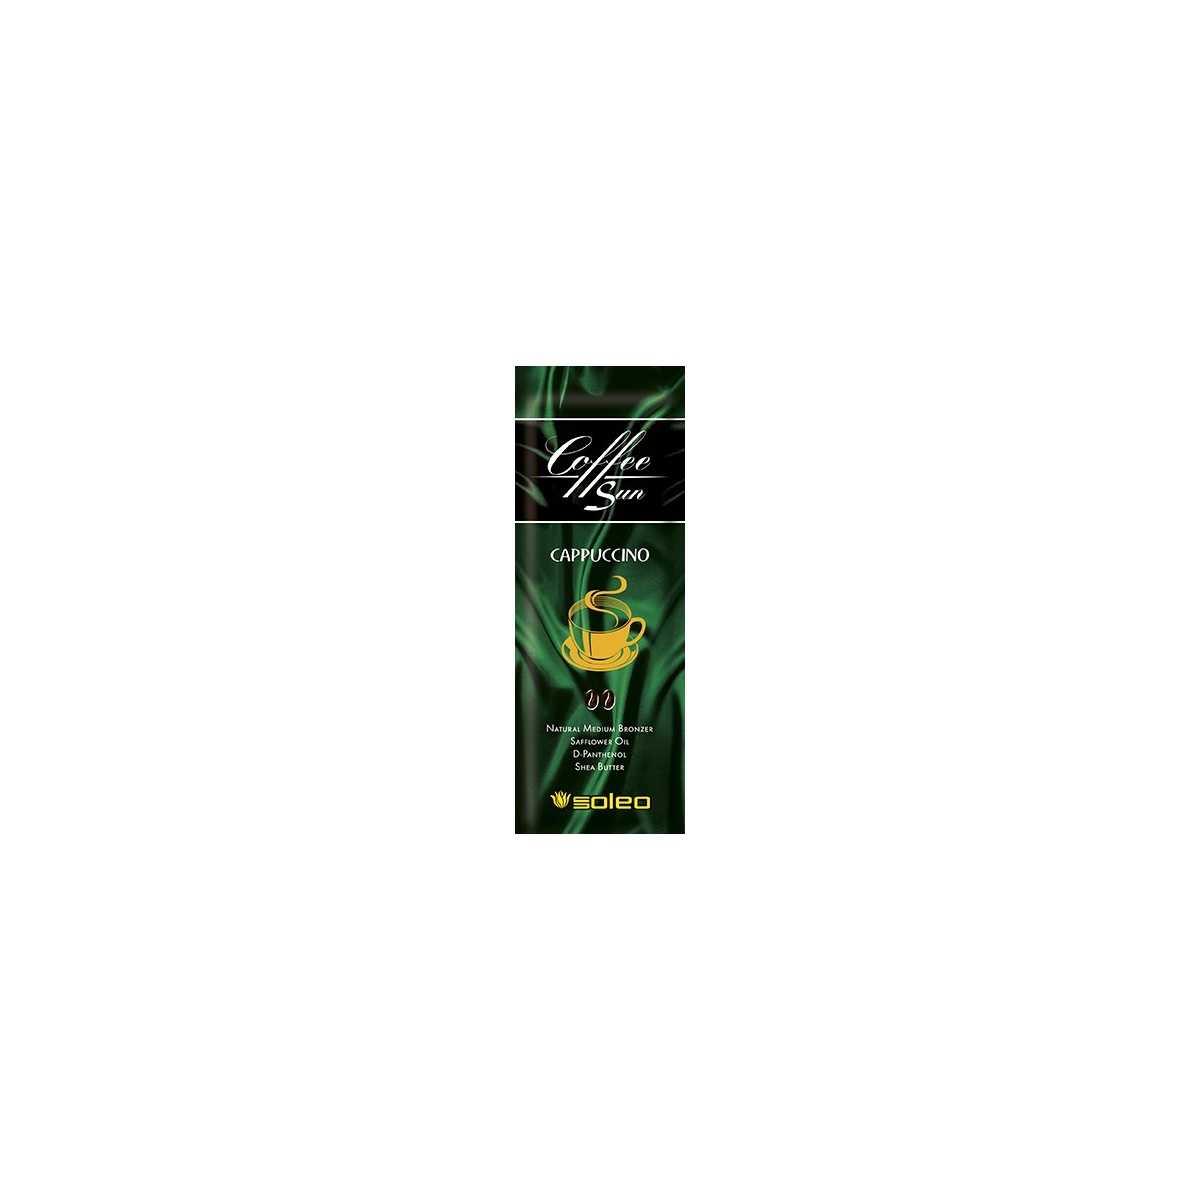 Capuccino 15ml - Soleo